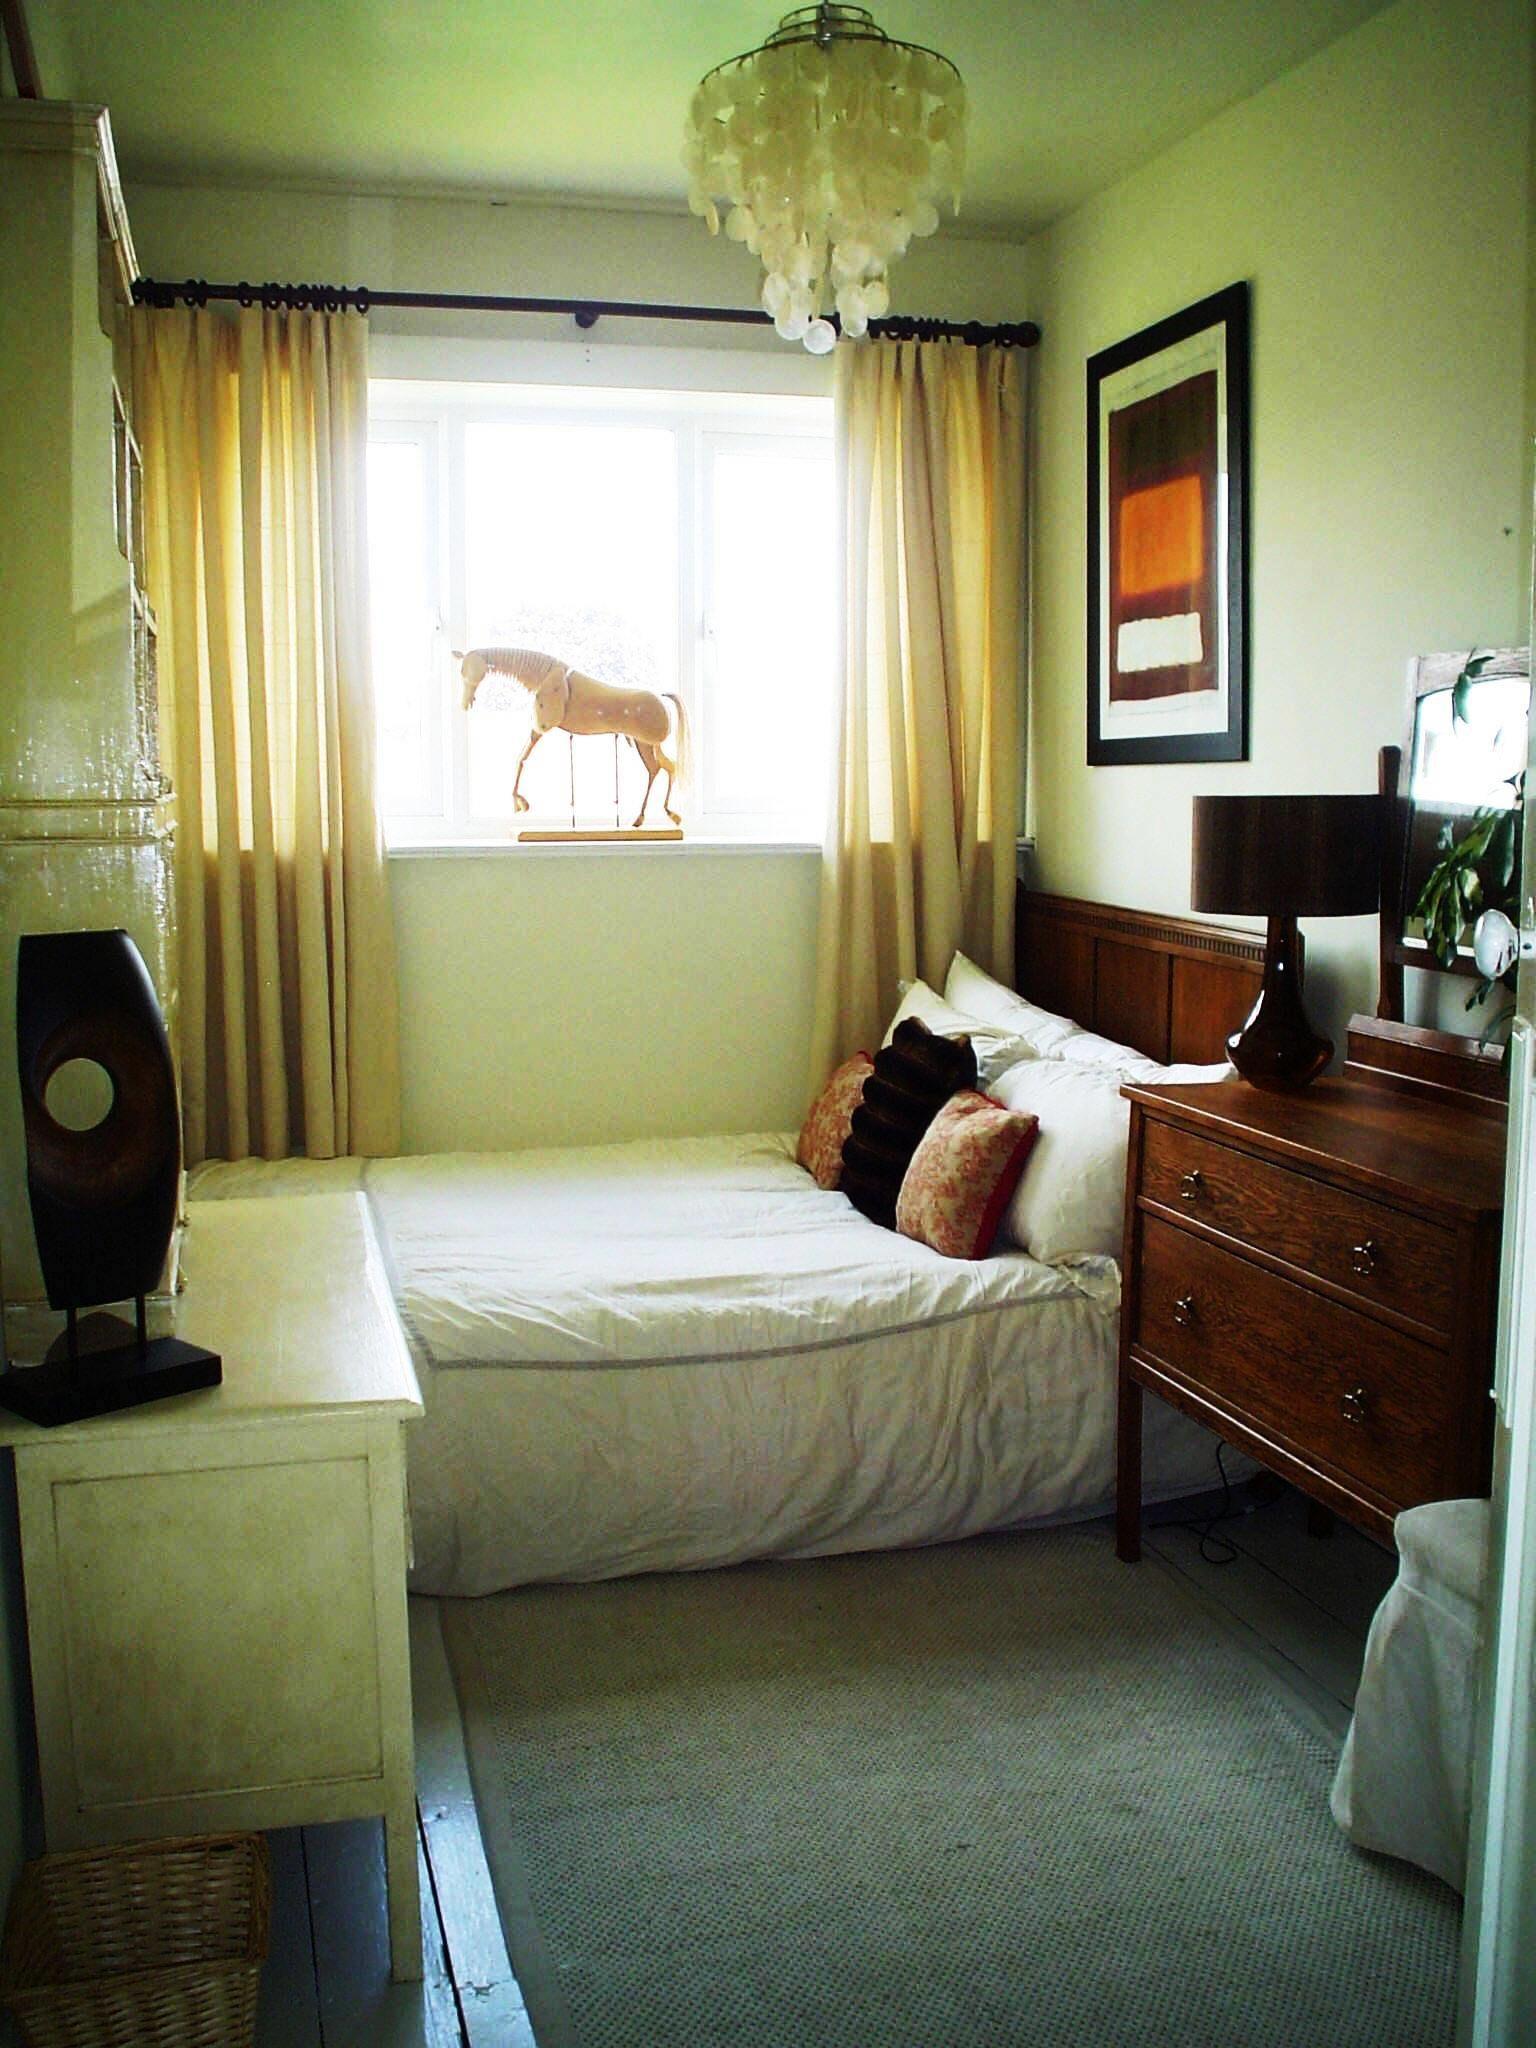 Tv in small bedroom decorating ideas BEDROOM IDEAS DECORATING